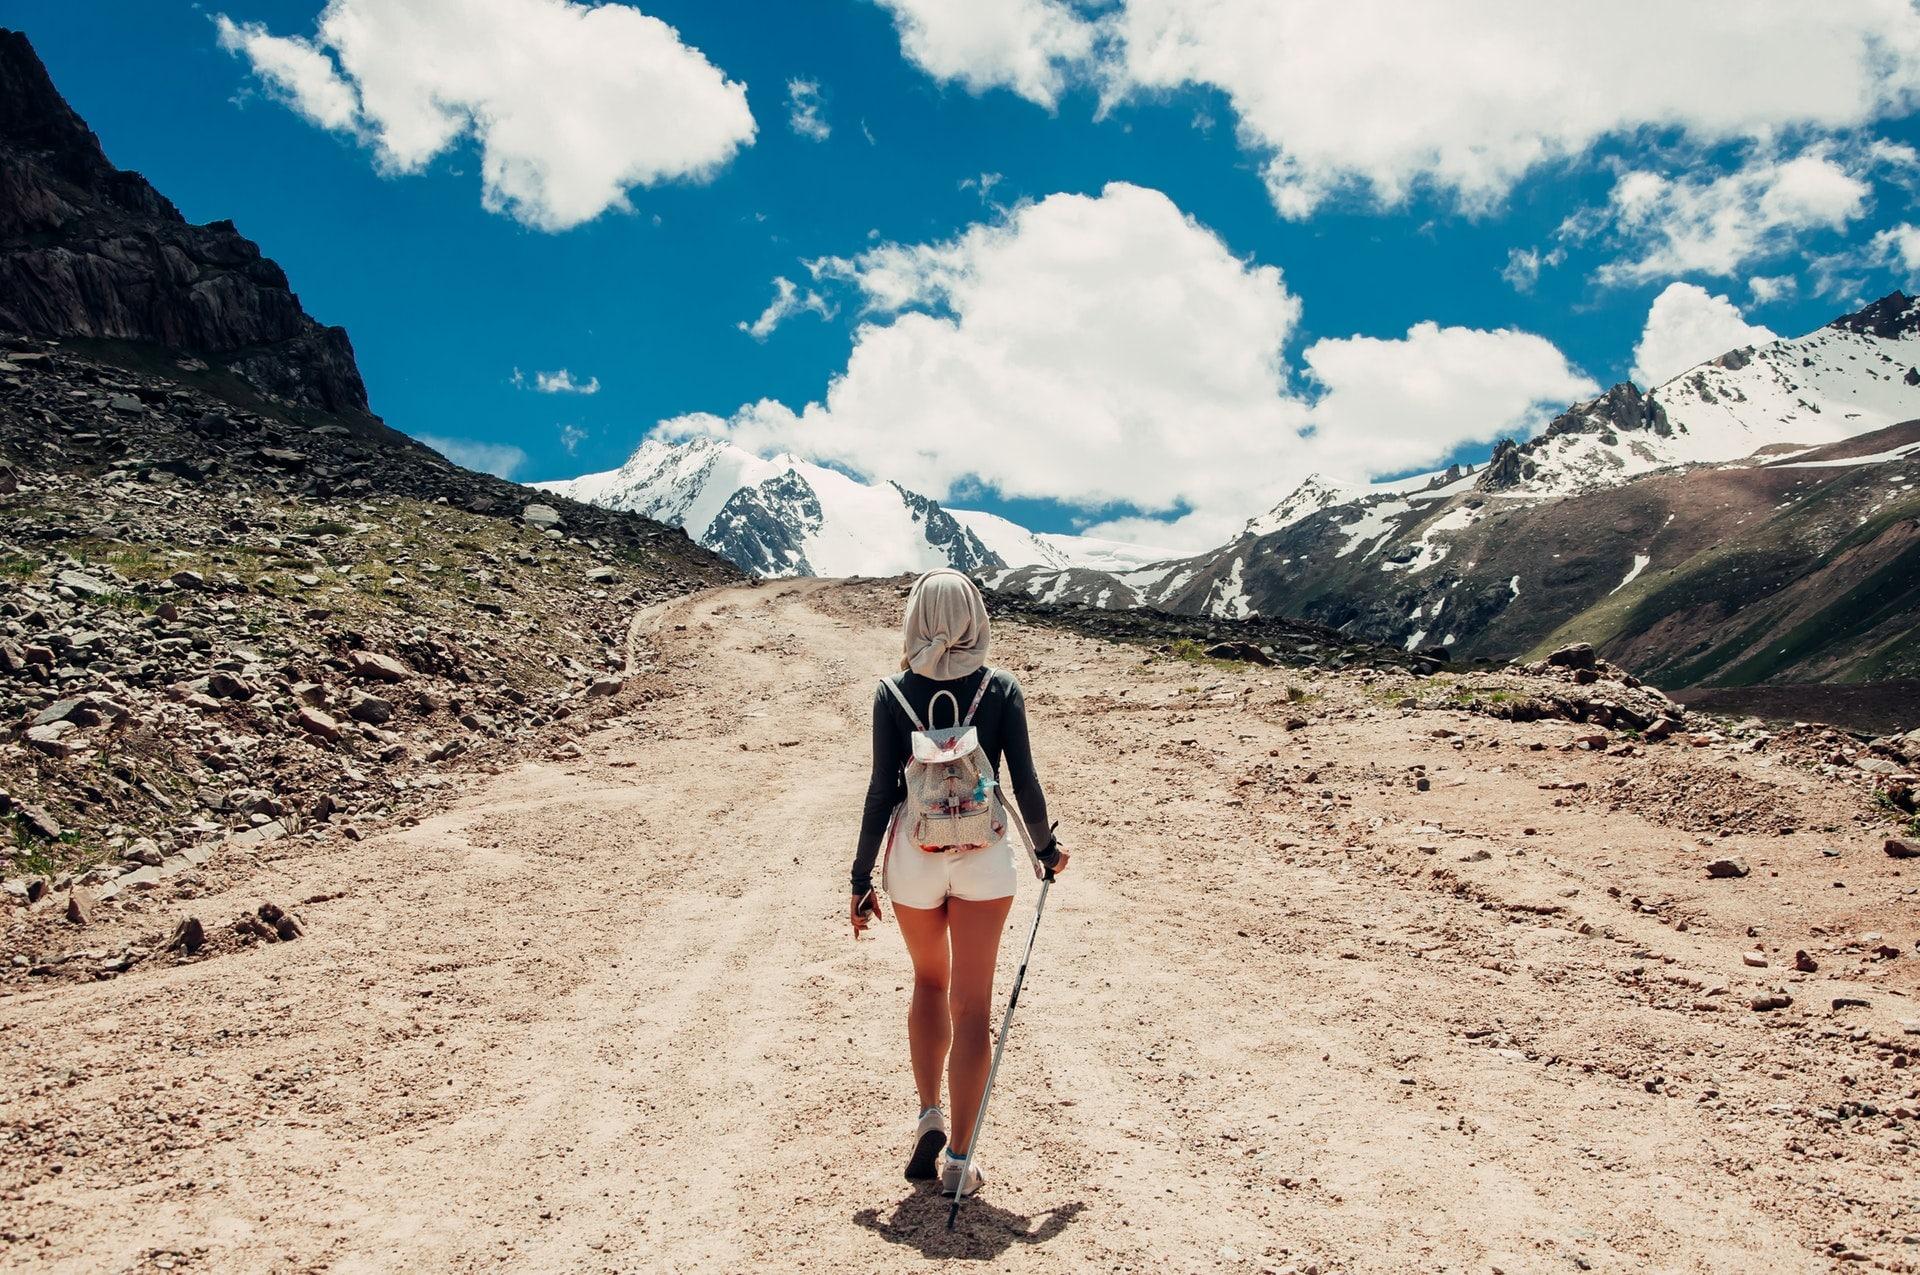 Au Pair   Work and Travel   Стажировки зарубежом   Языковые курсы - Royal education & Tourism